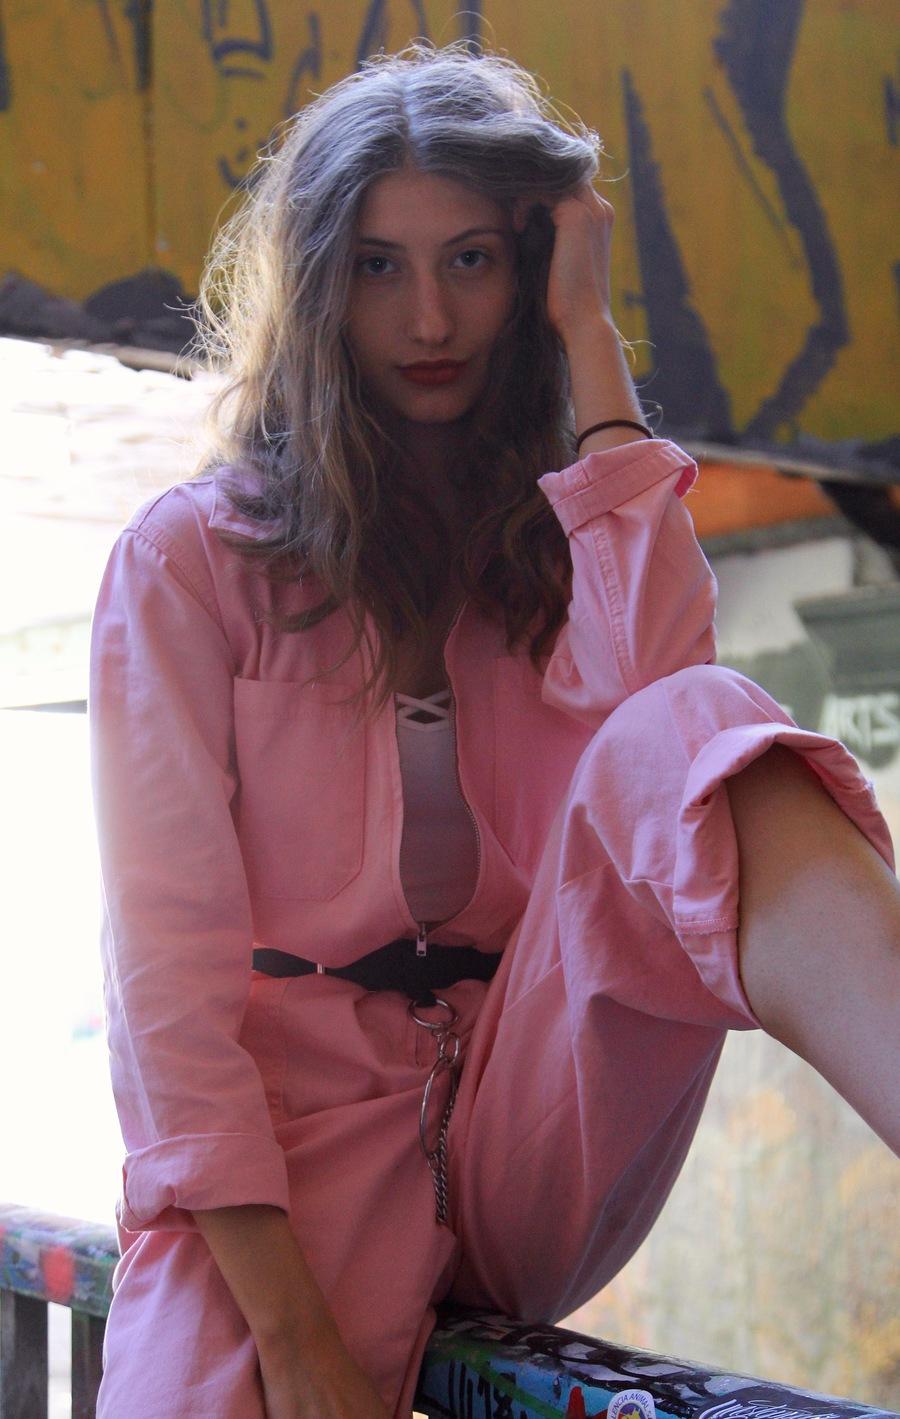 Alek / Photography by DaveinSurrey, Model AlekWalent / Uploaded 22nd September 2019 @ 09:26 AM